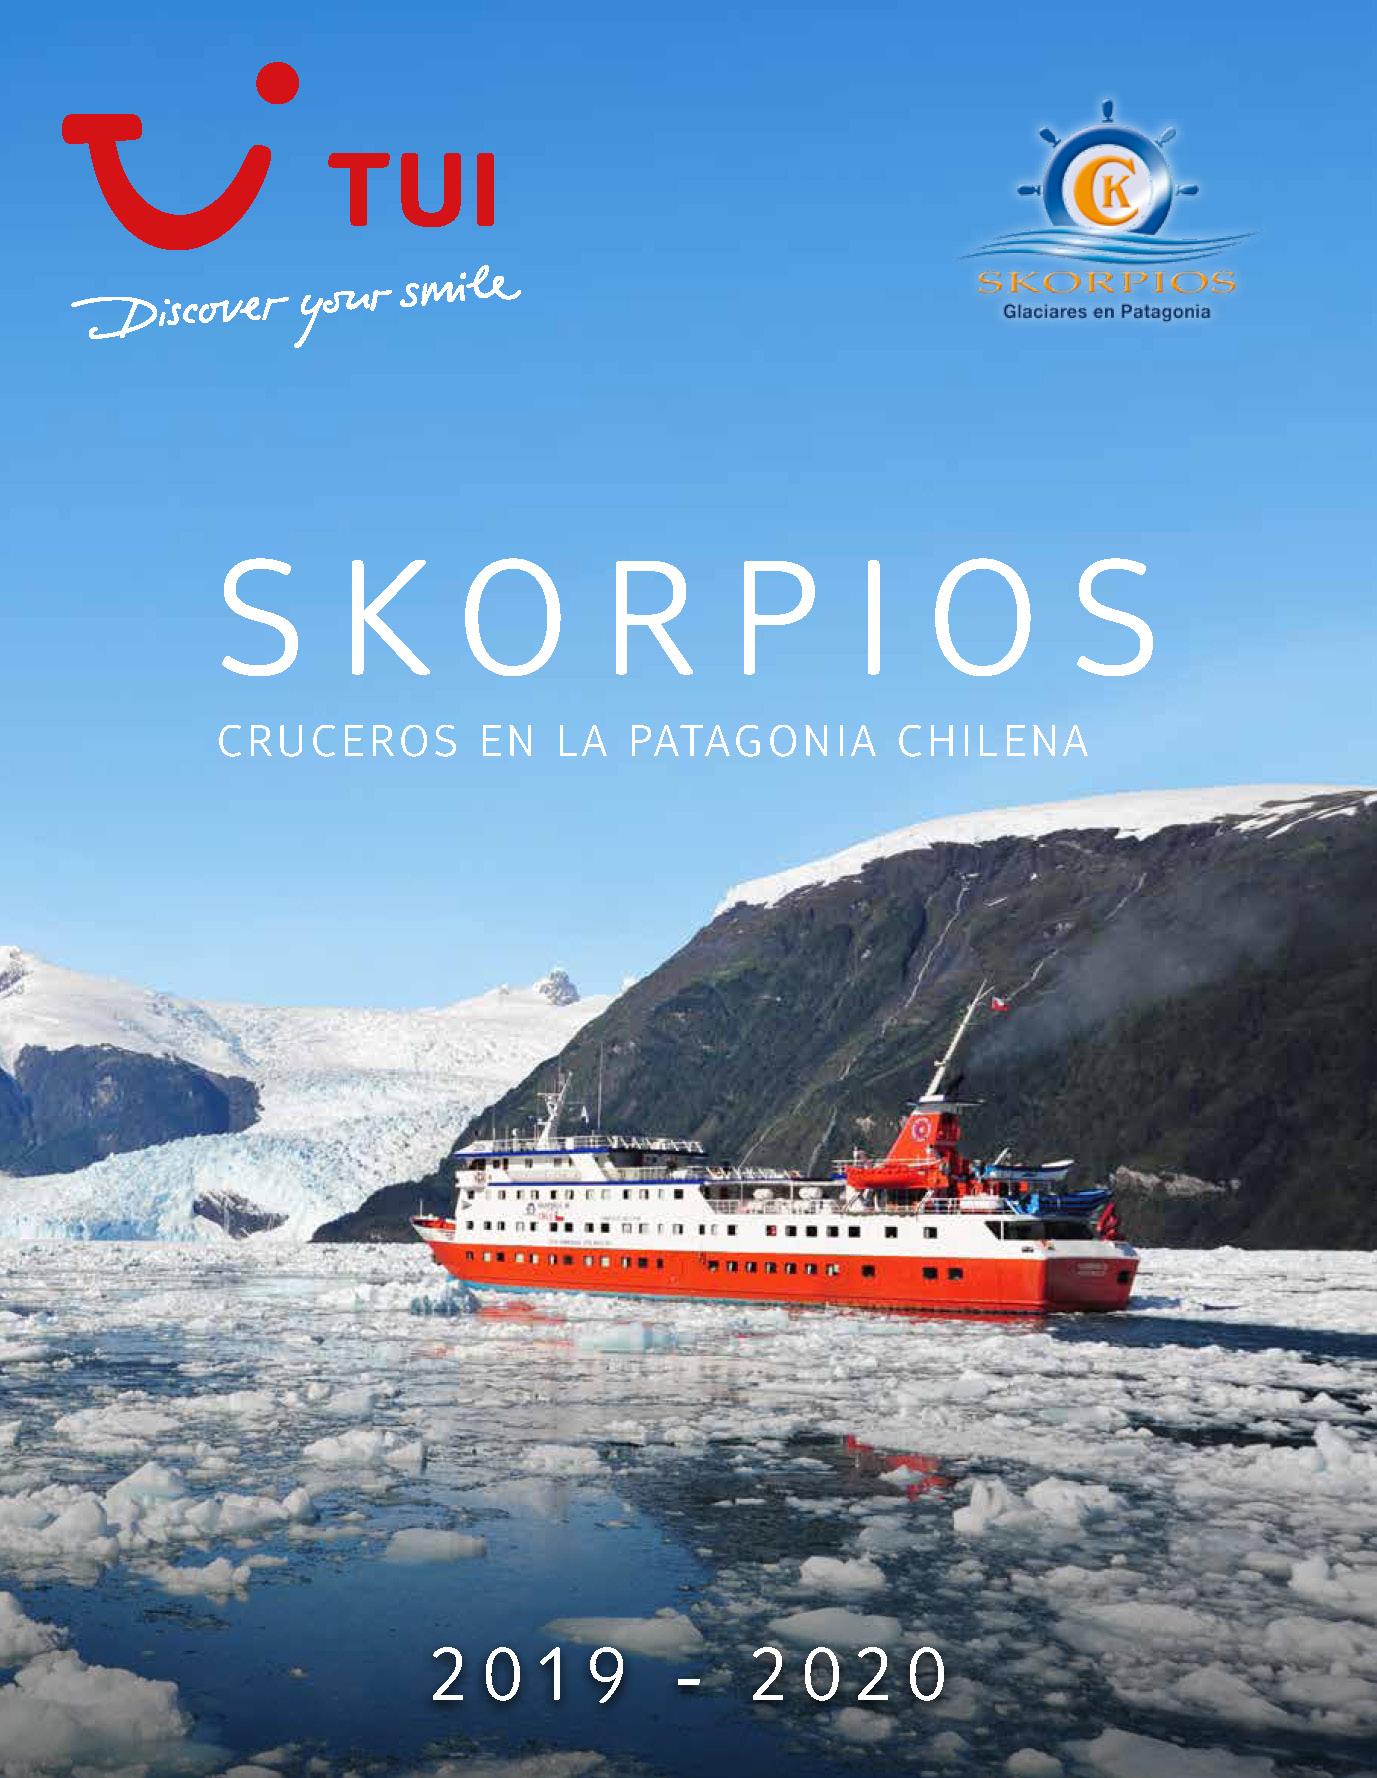 Catalogo TUI Ambassador Tours Cruceros Skorpios 2019-2020